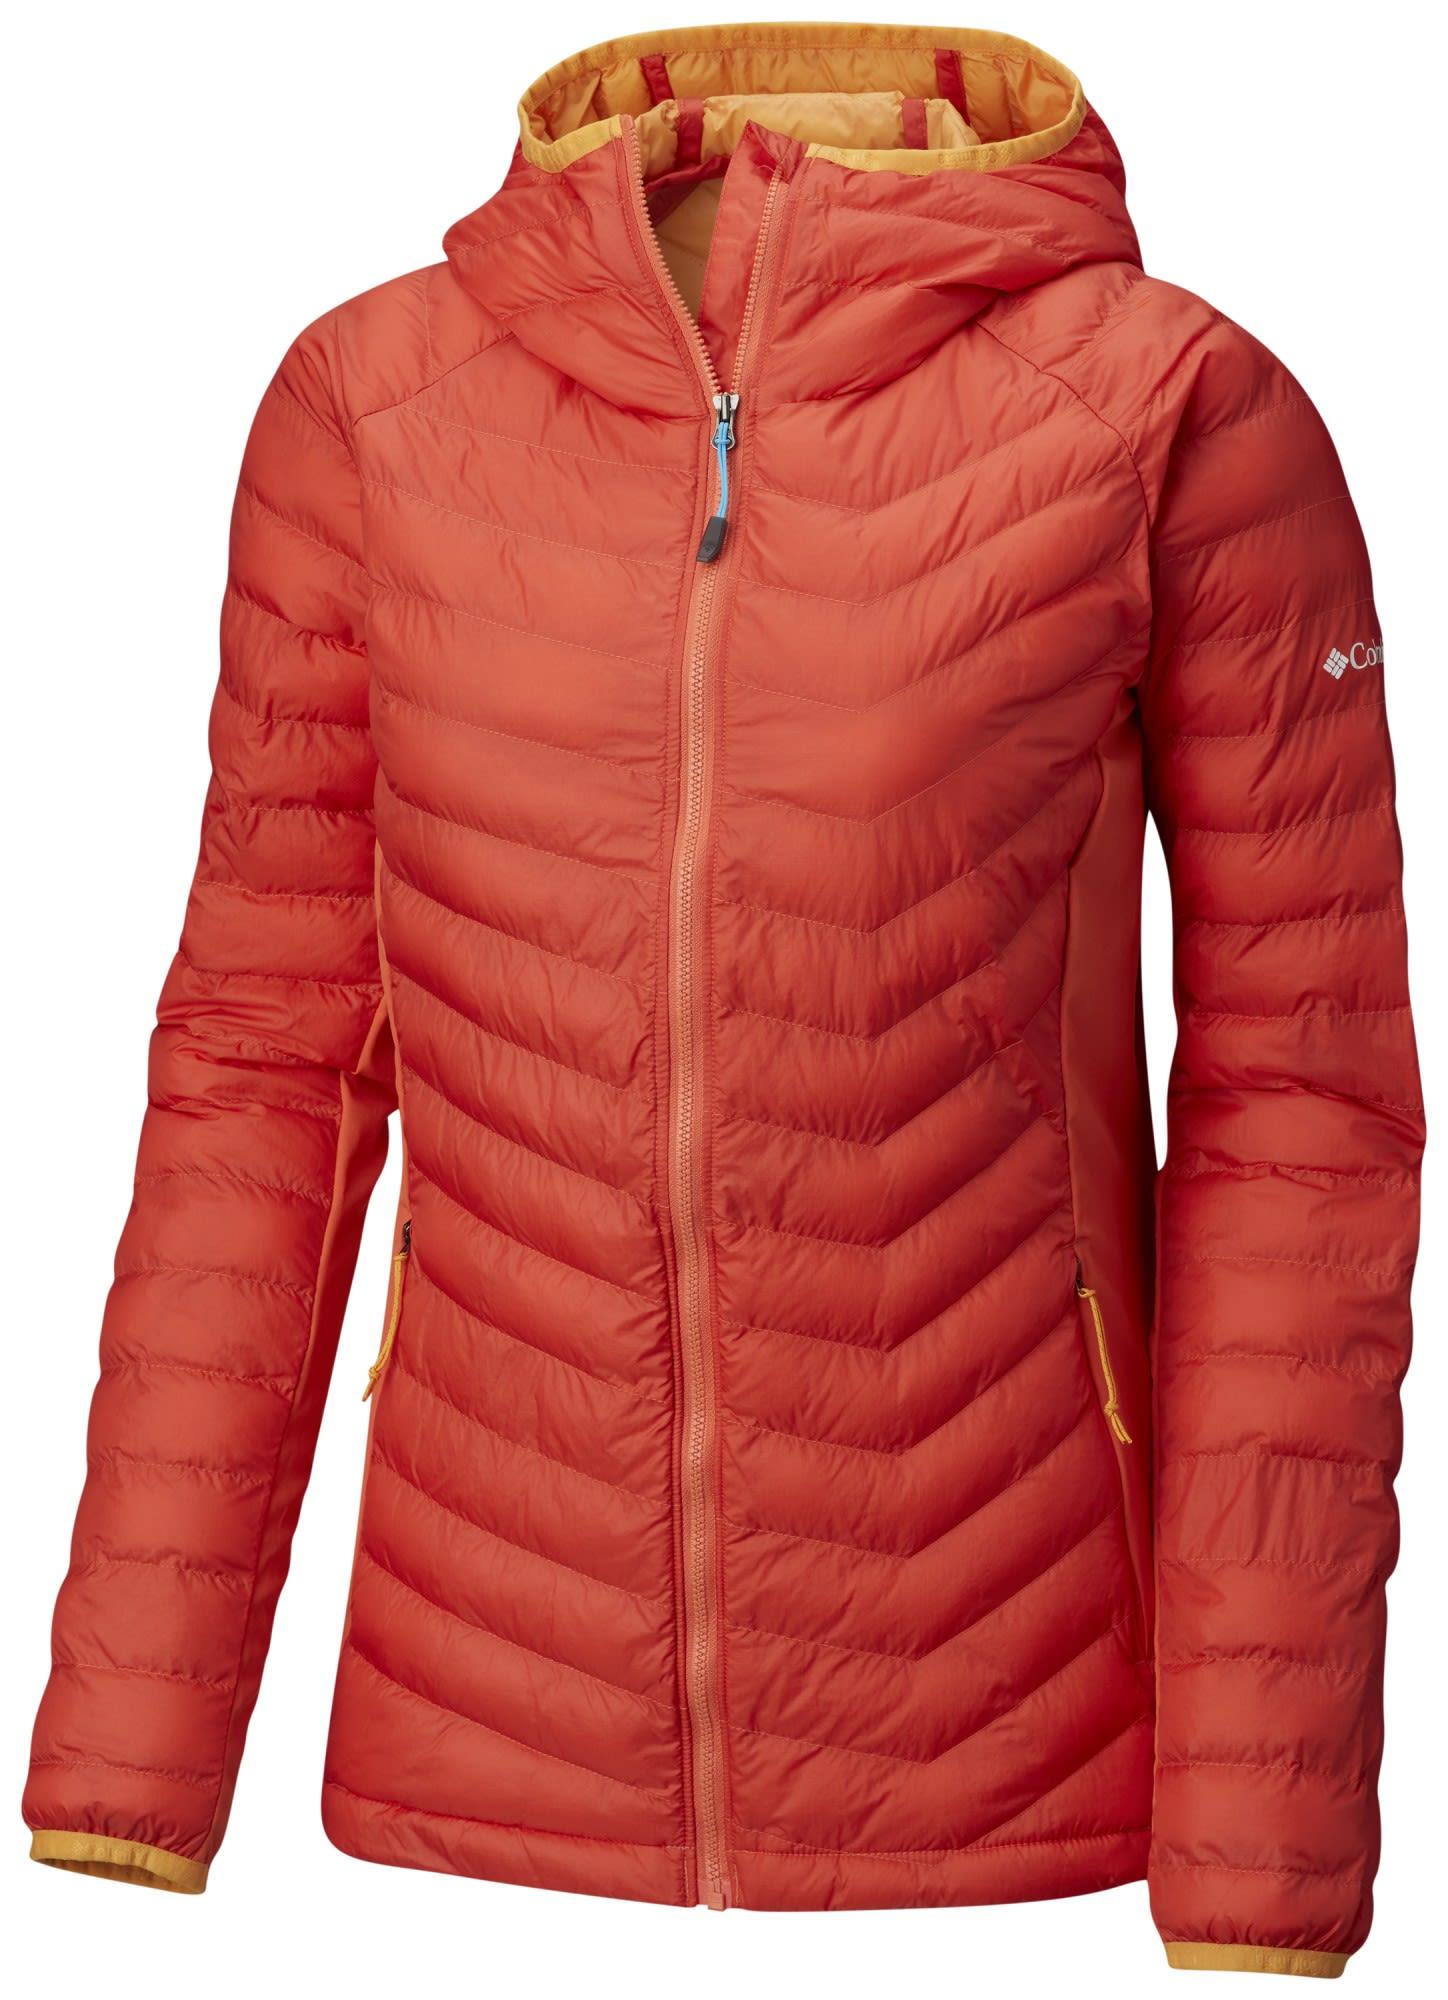 Columbia W Powder Lite Light Hooded Jacket   Größe XS,S,M,L,XL   Damen Freizei